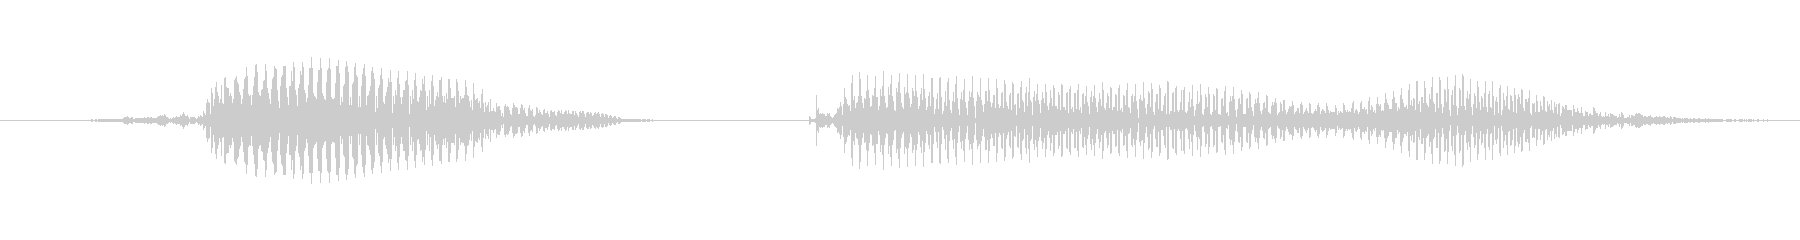 Really (female, girl)'s unreproduced waveform